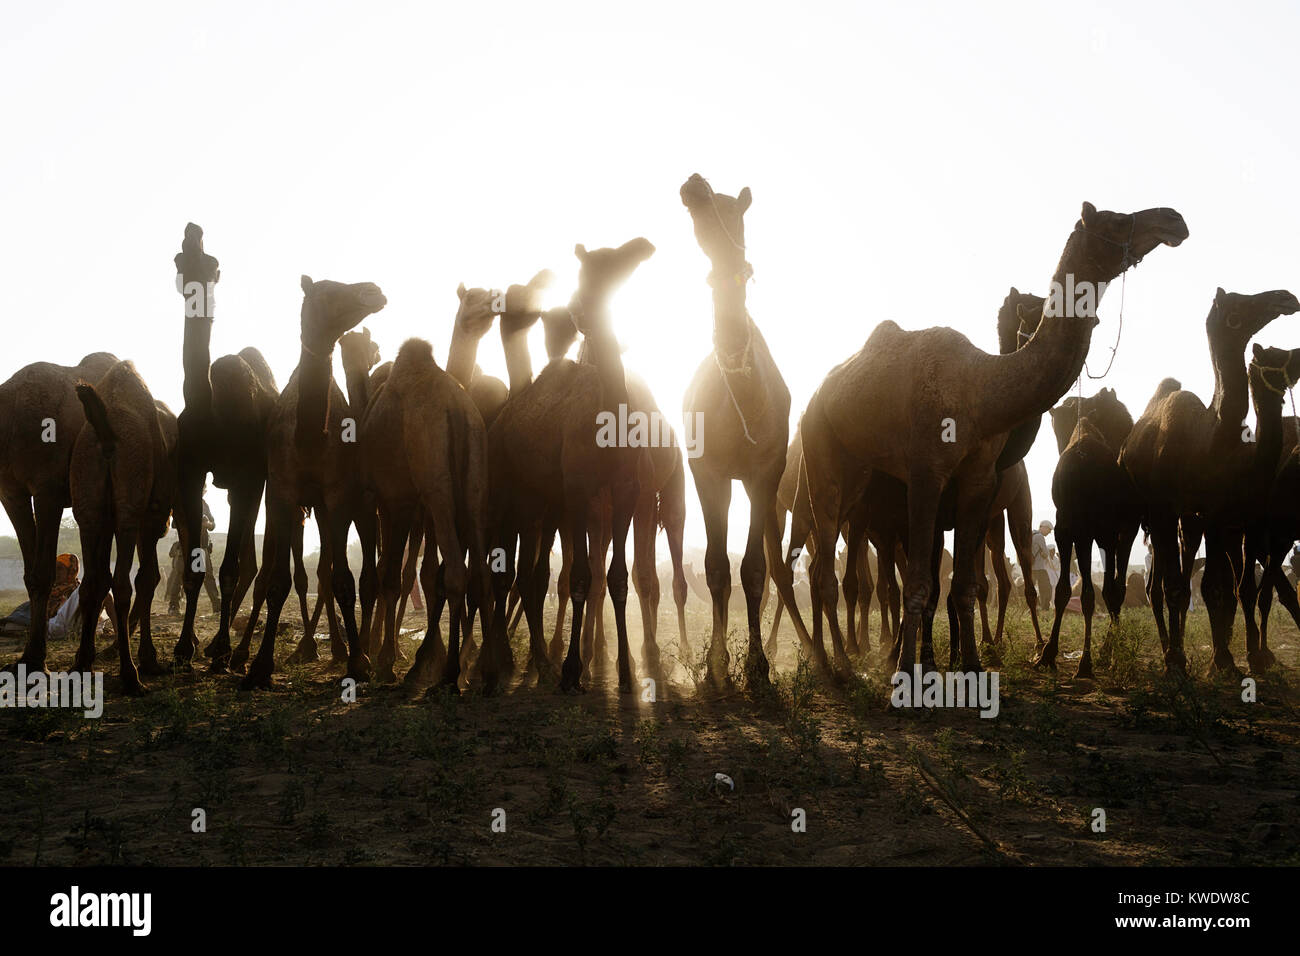 Scene at Pushkar Camel Fair, herd of camels, back light, morning, Pushkar, Rajasthan, India - Stock Image